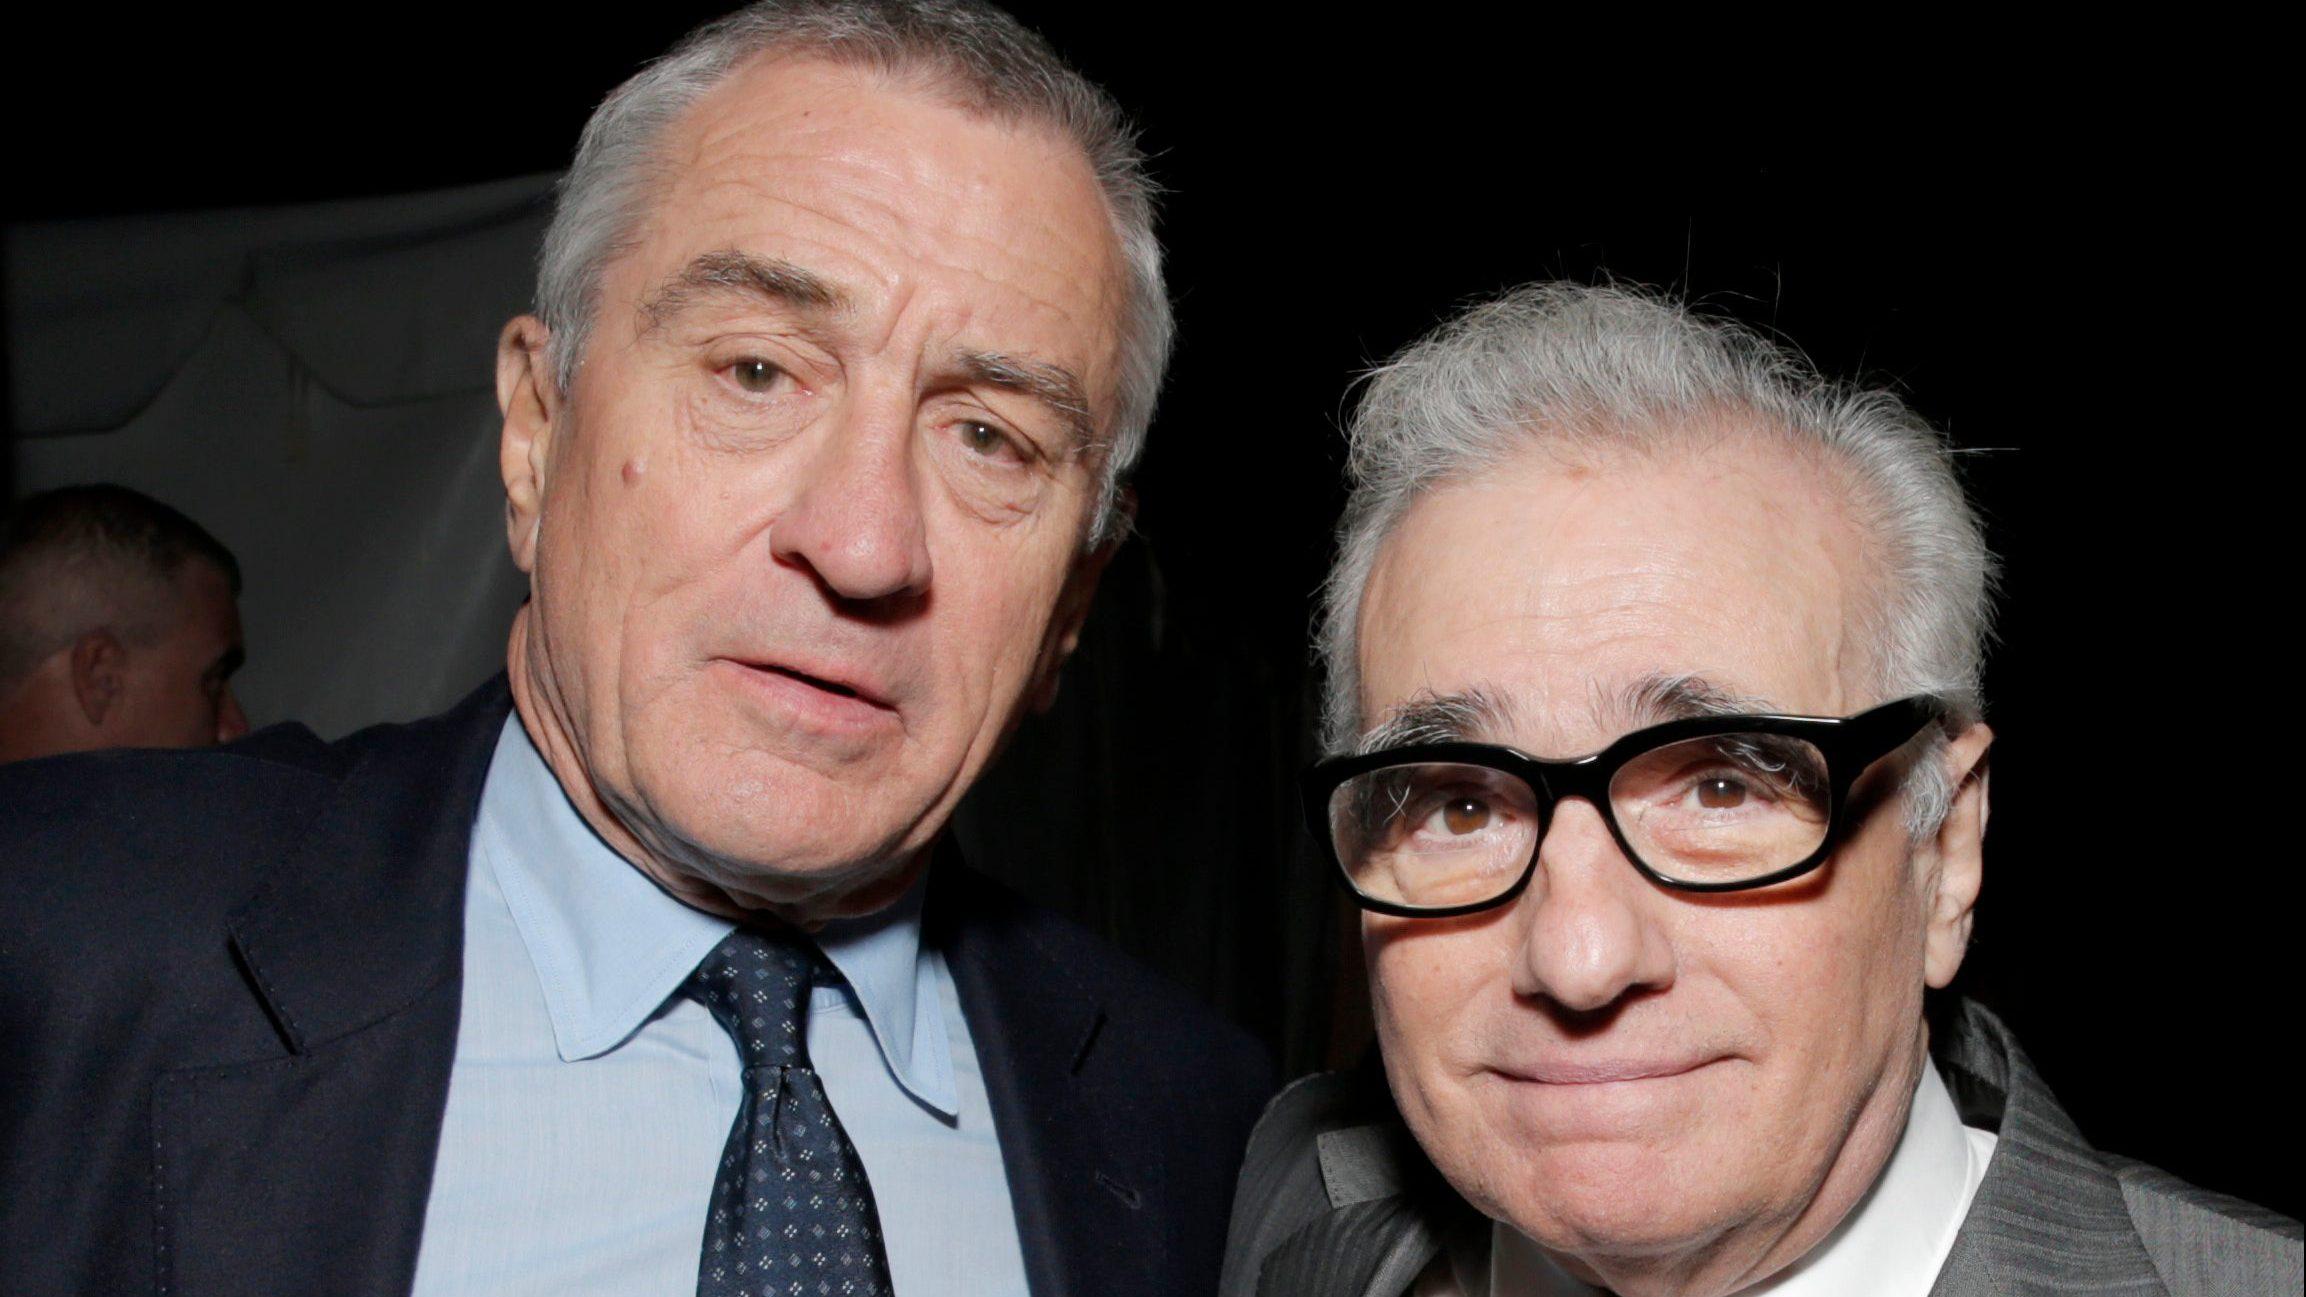 Robert De Niro Martin Scorsese Talk Their Work At Tribeca Touch On Irishman Deadline